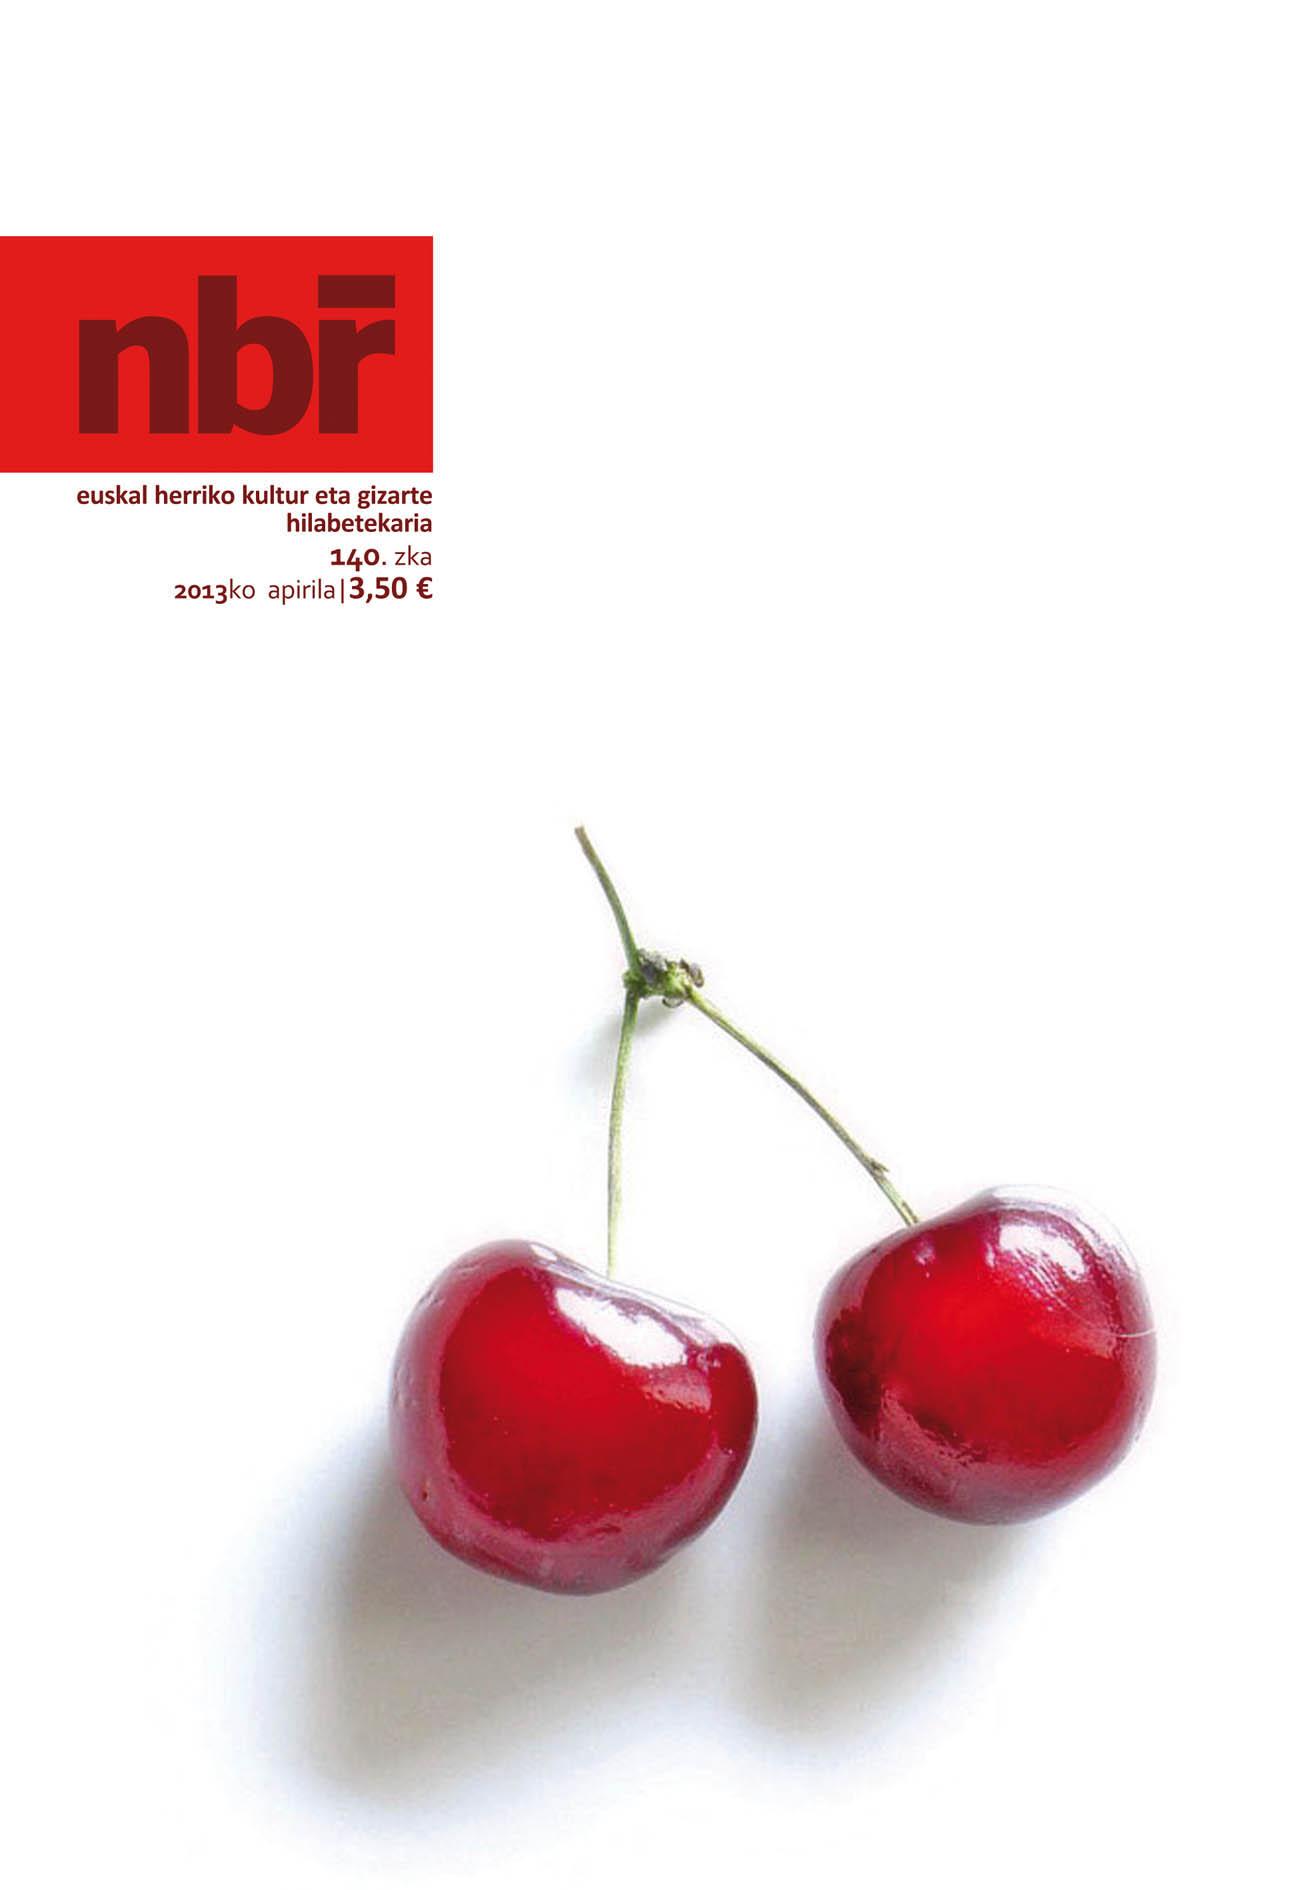 nbr_140